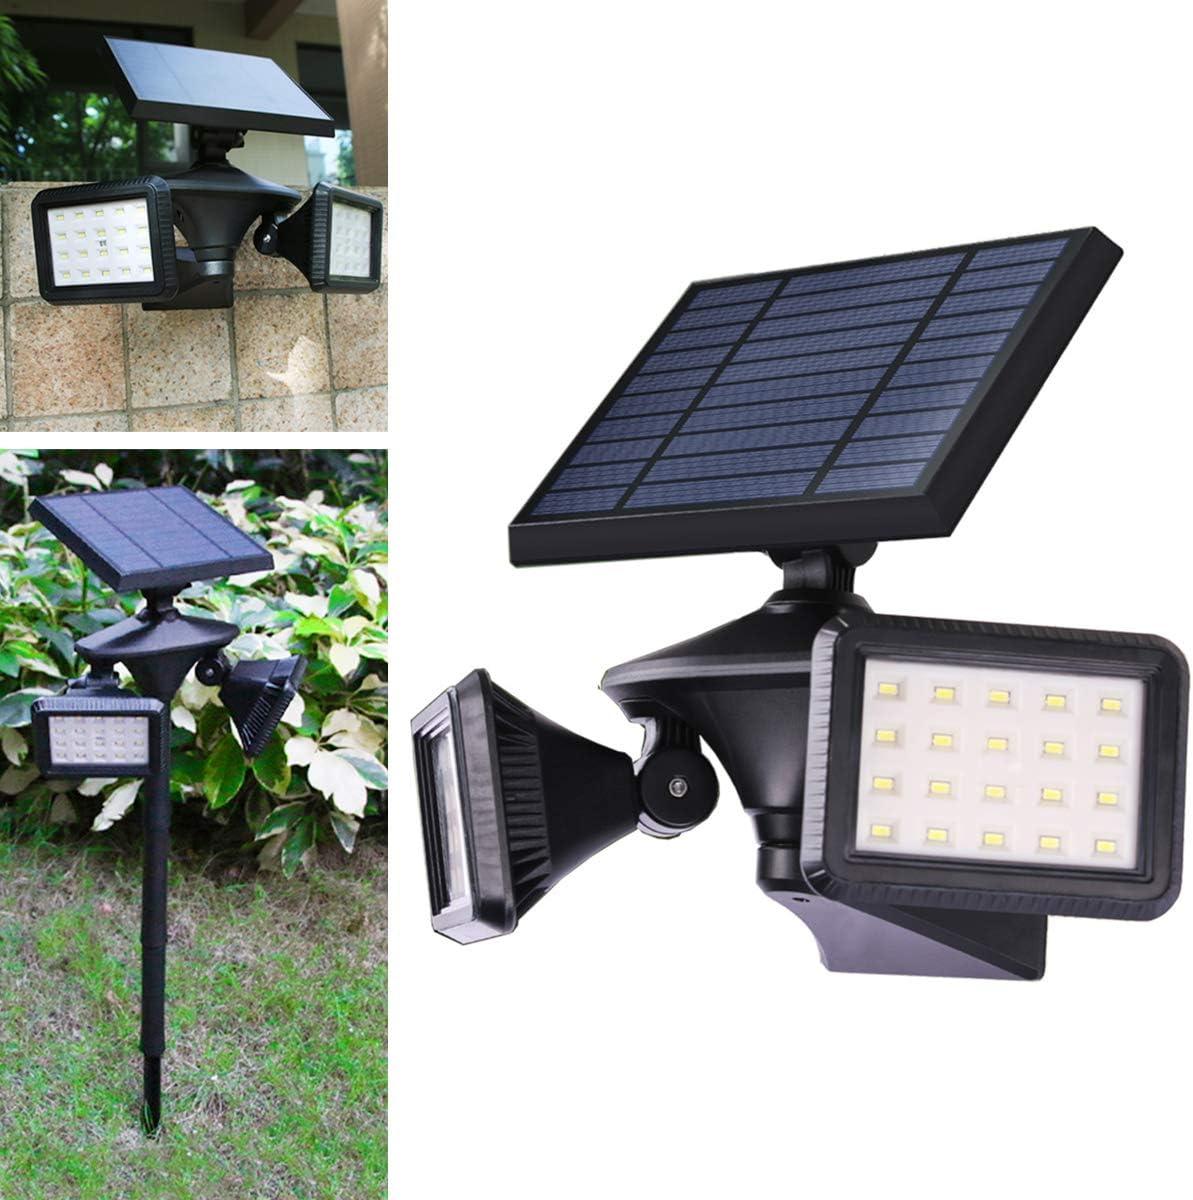 Solar Lights Outdoor, Motion Sensor Solar Flood Lights, Dusk to Dawn Landscape Spotlights, Wireless Security Lights 6500K, 2-in-1 for Garden Driveway Porch Path Solar Powered Lighting, EMANER